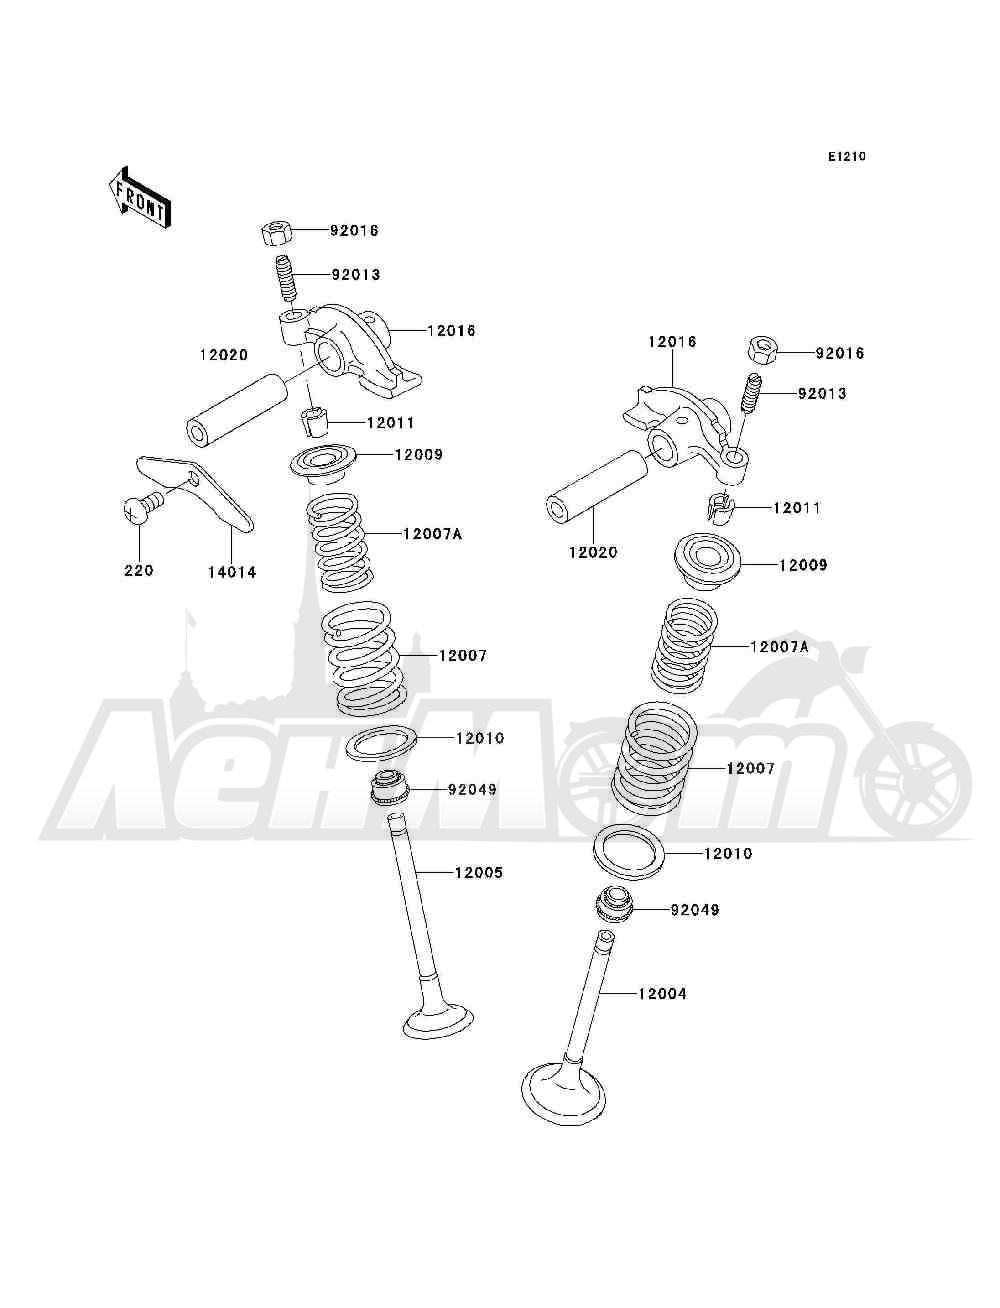 Запчасти для Квадроцикла Kawasaki 1993 BAYOU 300 4X4 (KLF300-C5) Раздел: VALVE(S)   клапан (S)